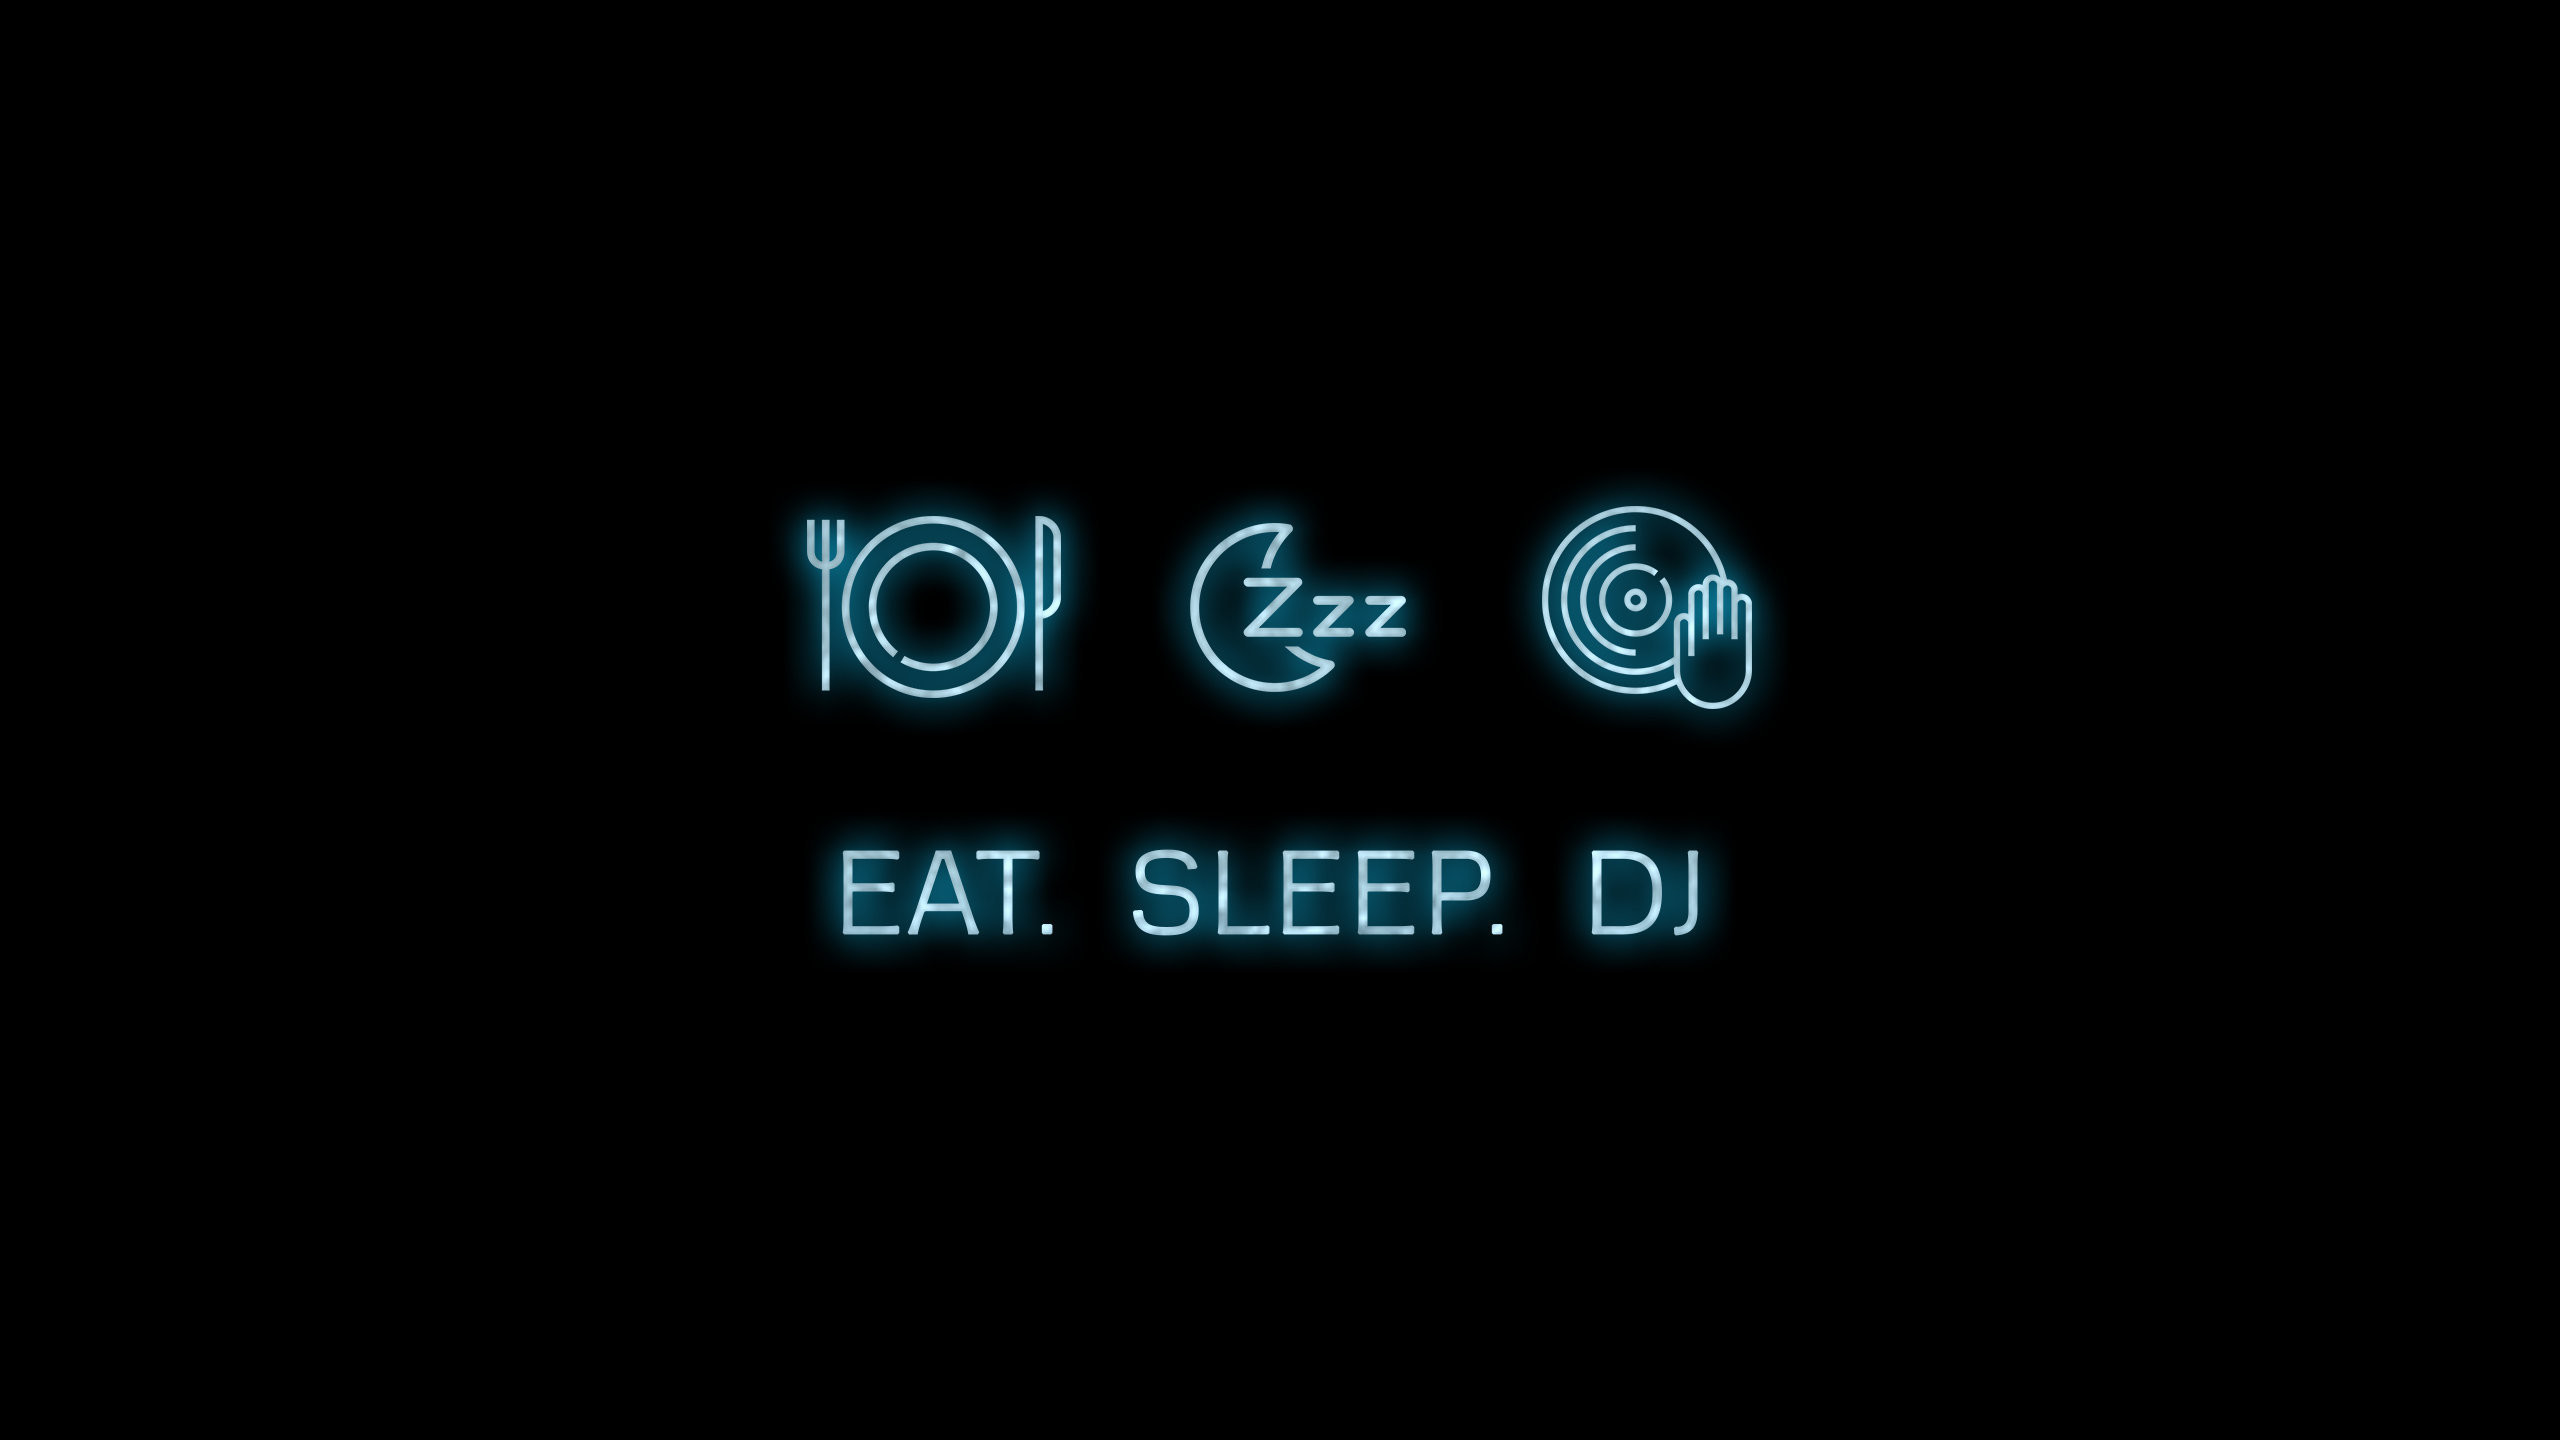 Eat, Sleep, DJ